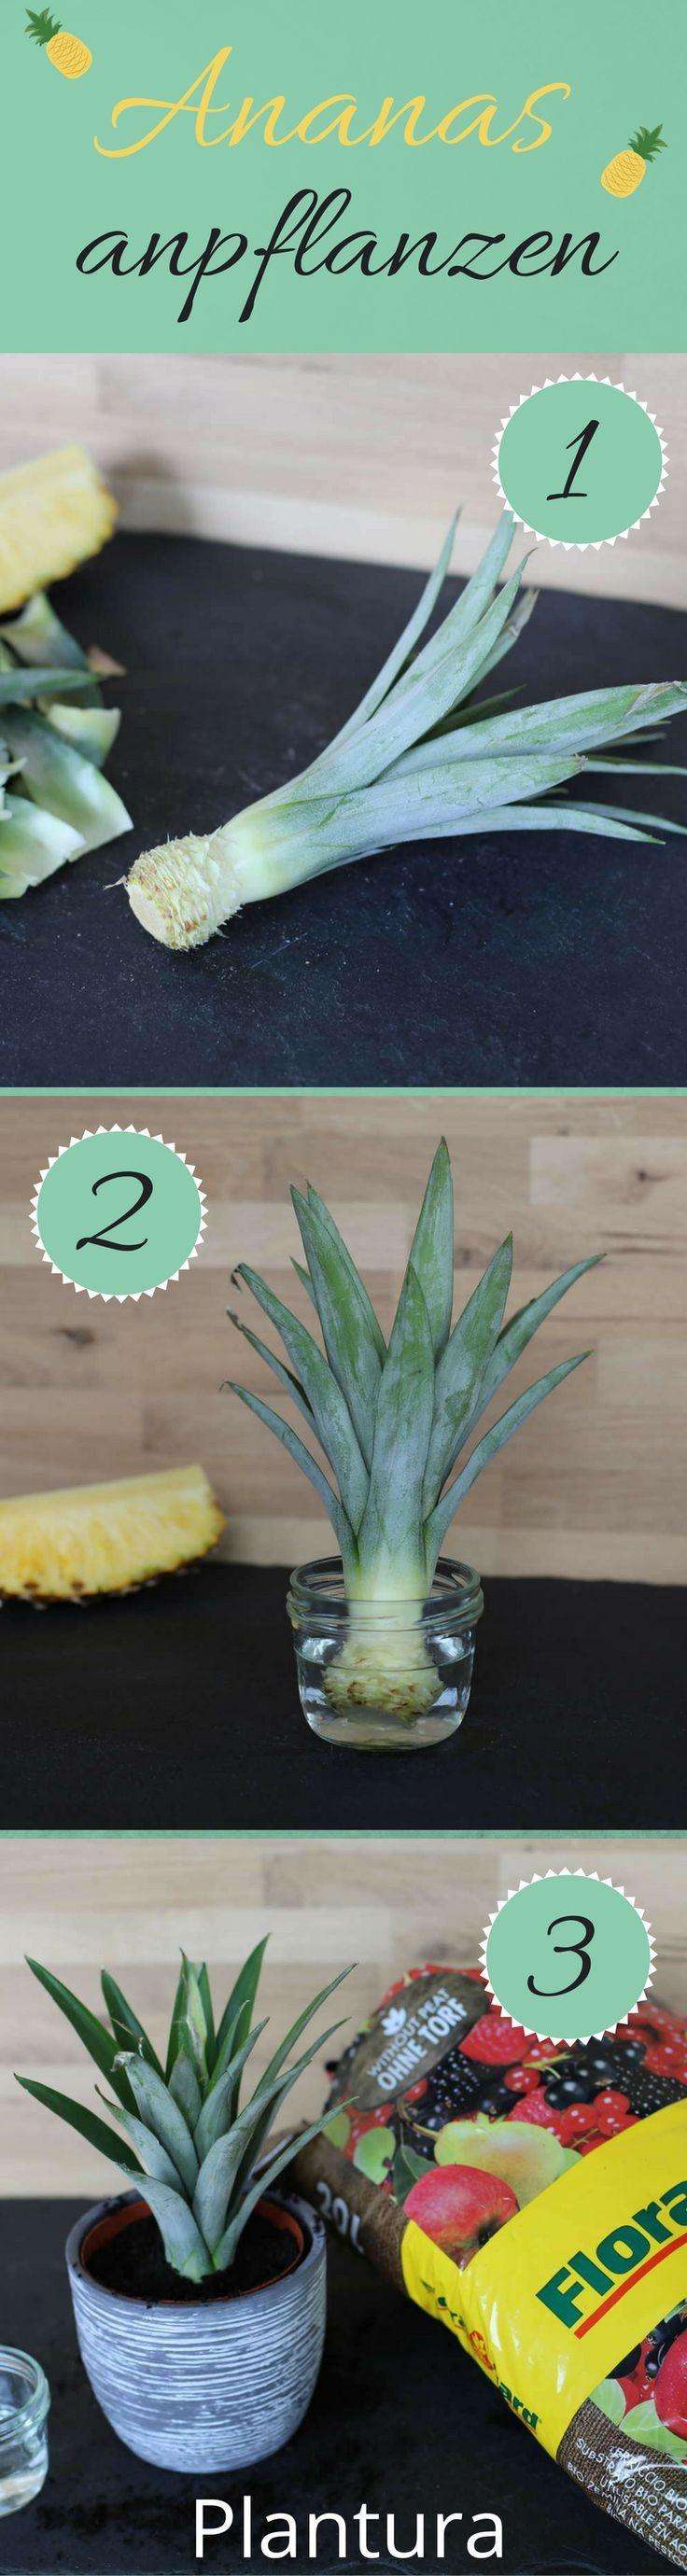 ananas anpflanzen vermehrung anbau anleitung. Black Bedroom Furniture Sets. Home Design Ideas